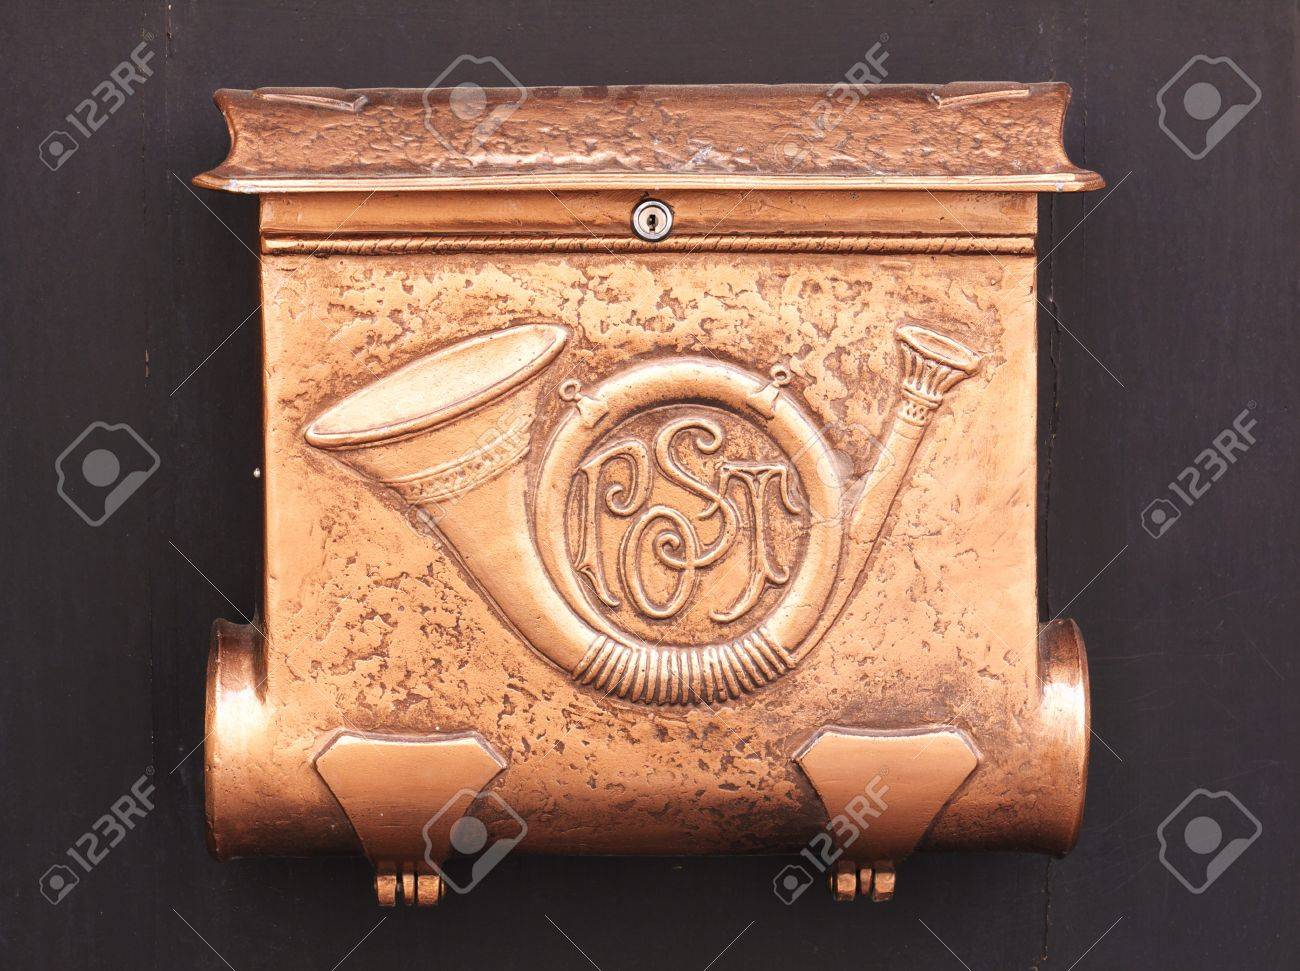 Copper mailbox with postal symbol stock photo picture and royalty copper mailbox with postal symbol stock photo 14564056 buycottarizona Image collections